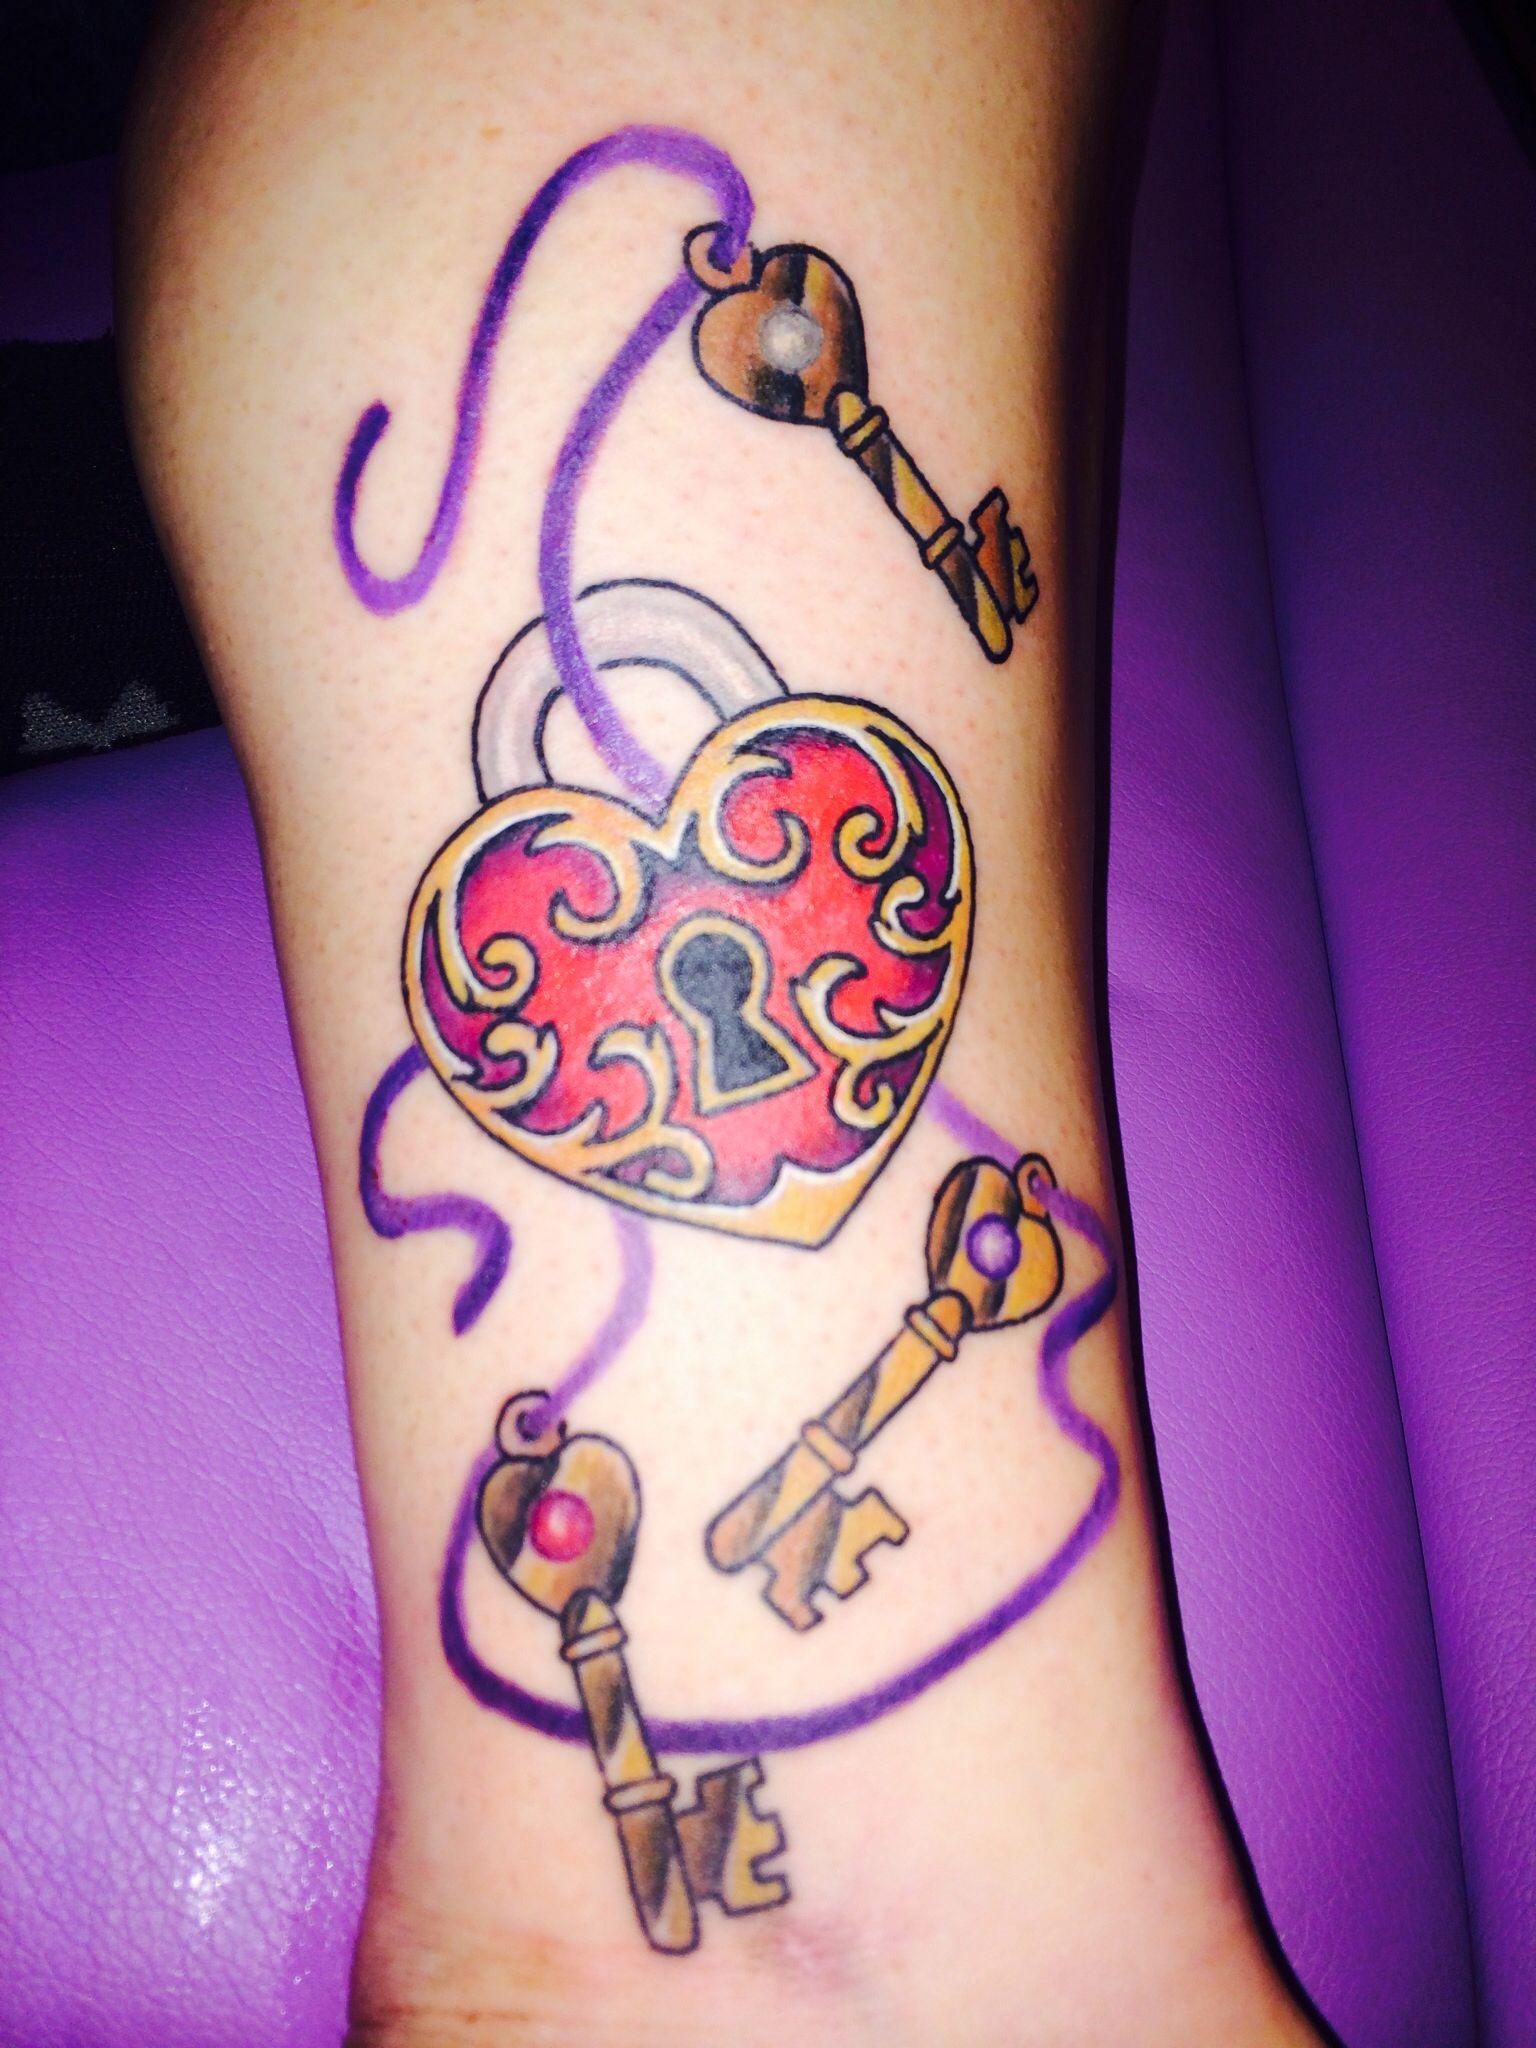 TATTOO LOVE Tatoo Heart Tatt Ink Body Art Valentine Keyring Keychain Key Gift